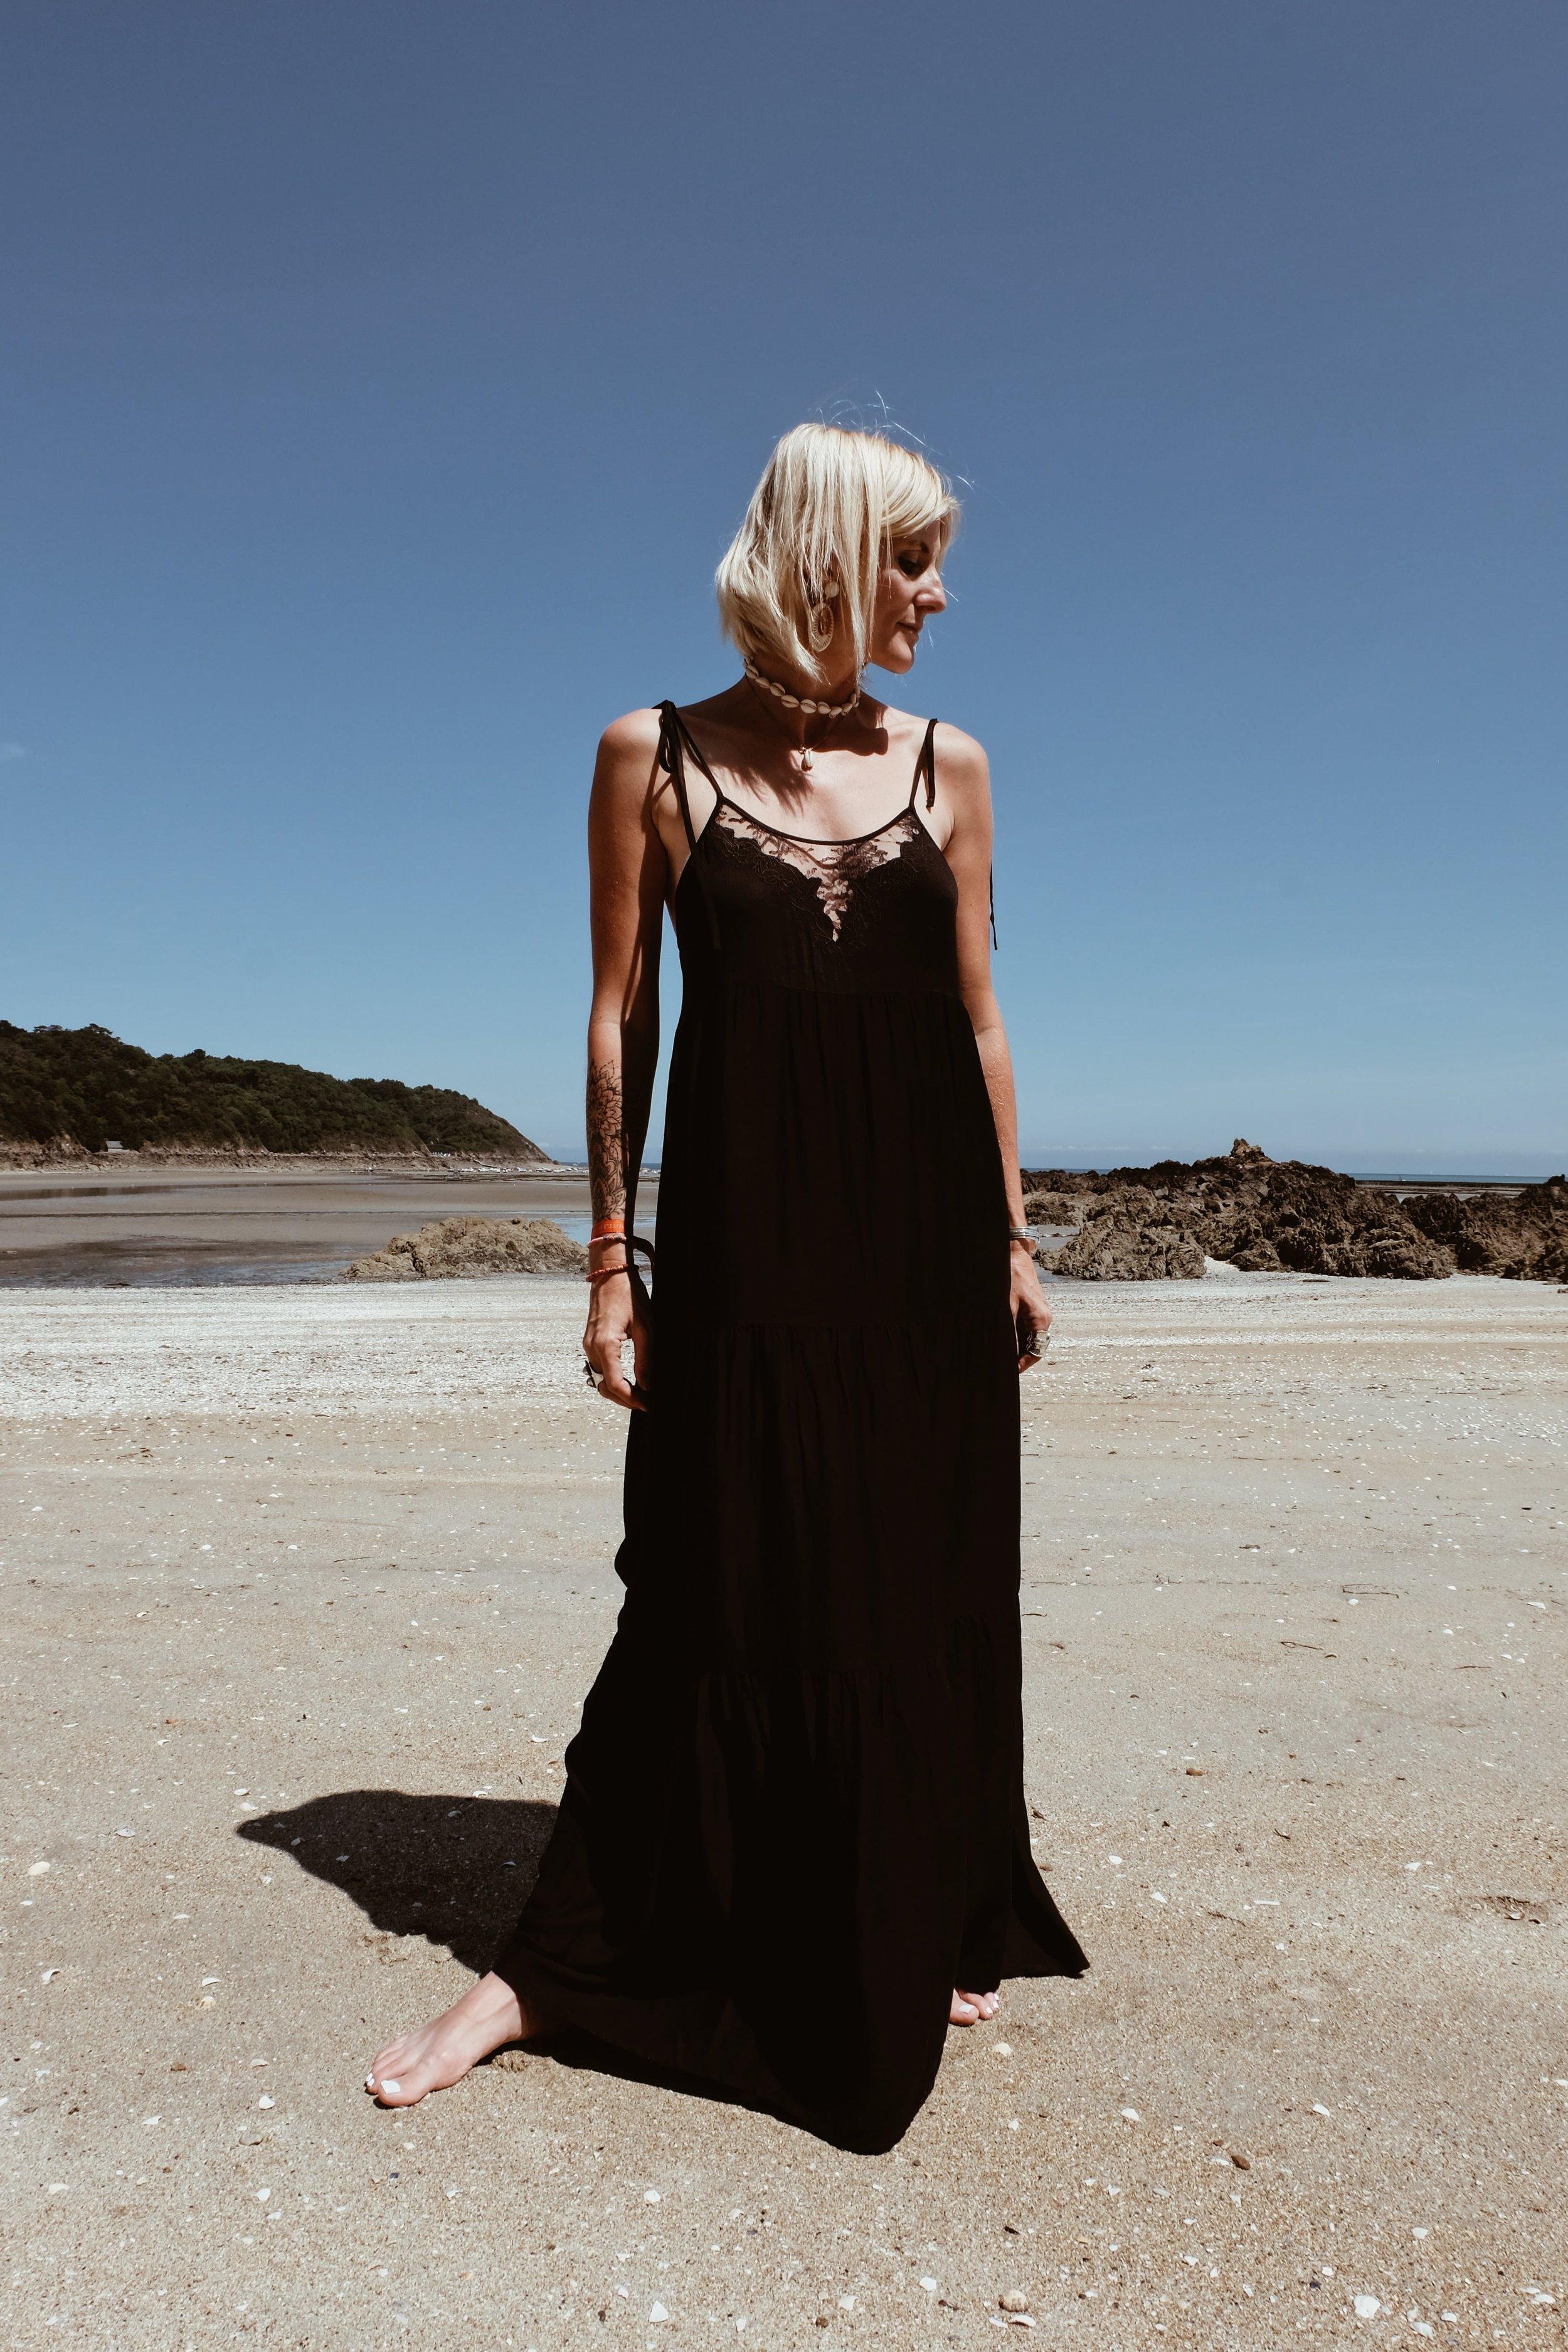 Carnet Sauvage - robe longue noire Stradivarius9.JPG